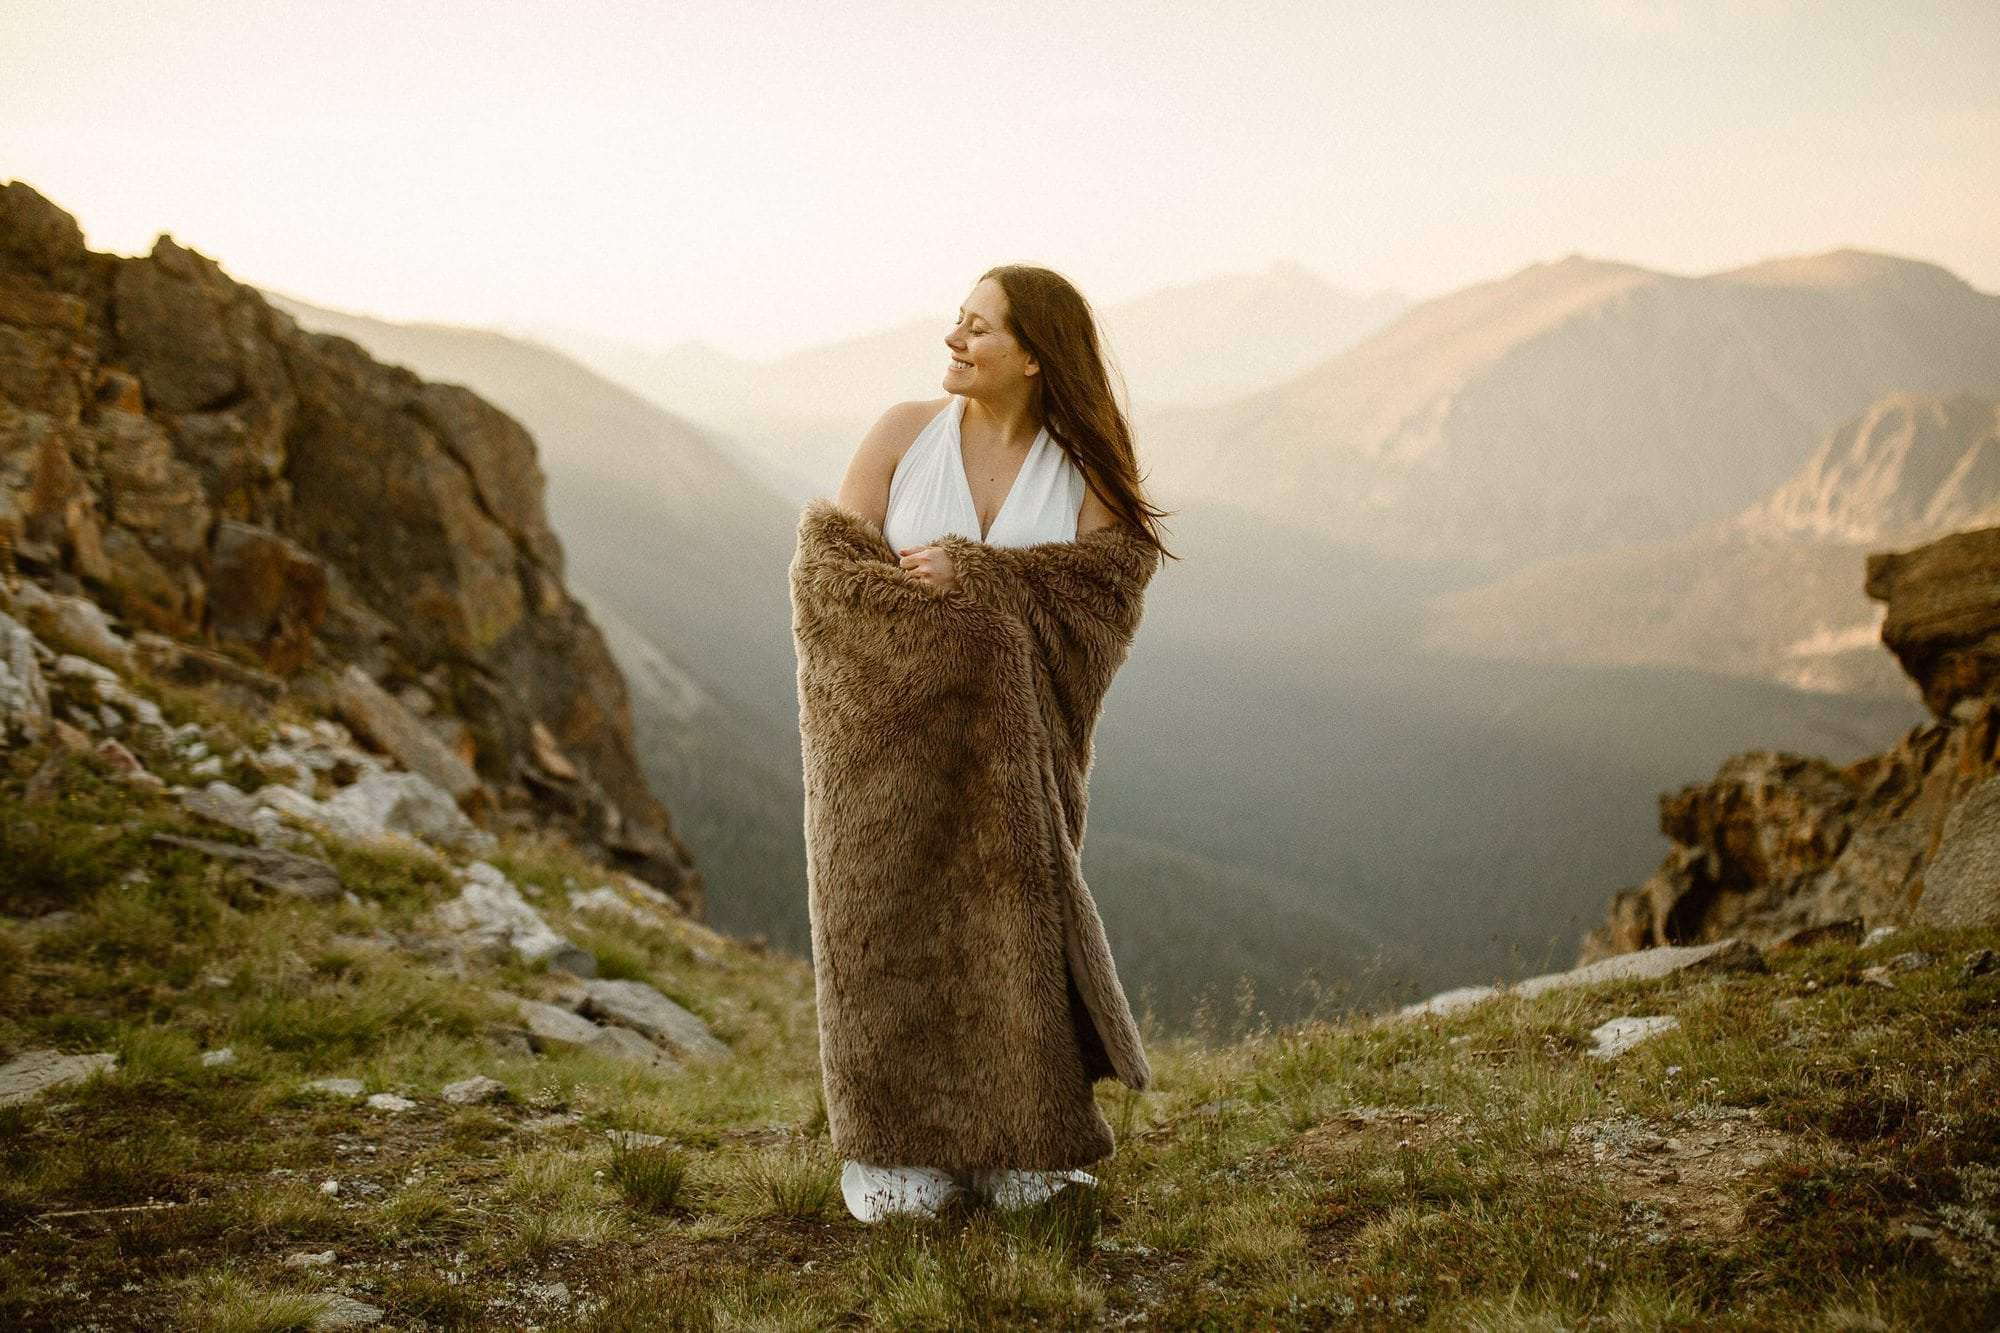 Colorado sunrise session. Colorado Intimate Weddings and Adventure Elopement Photographer | Rocky Mountain National Park Wedding Photographer | Adventure